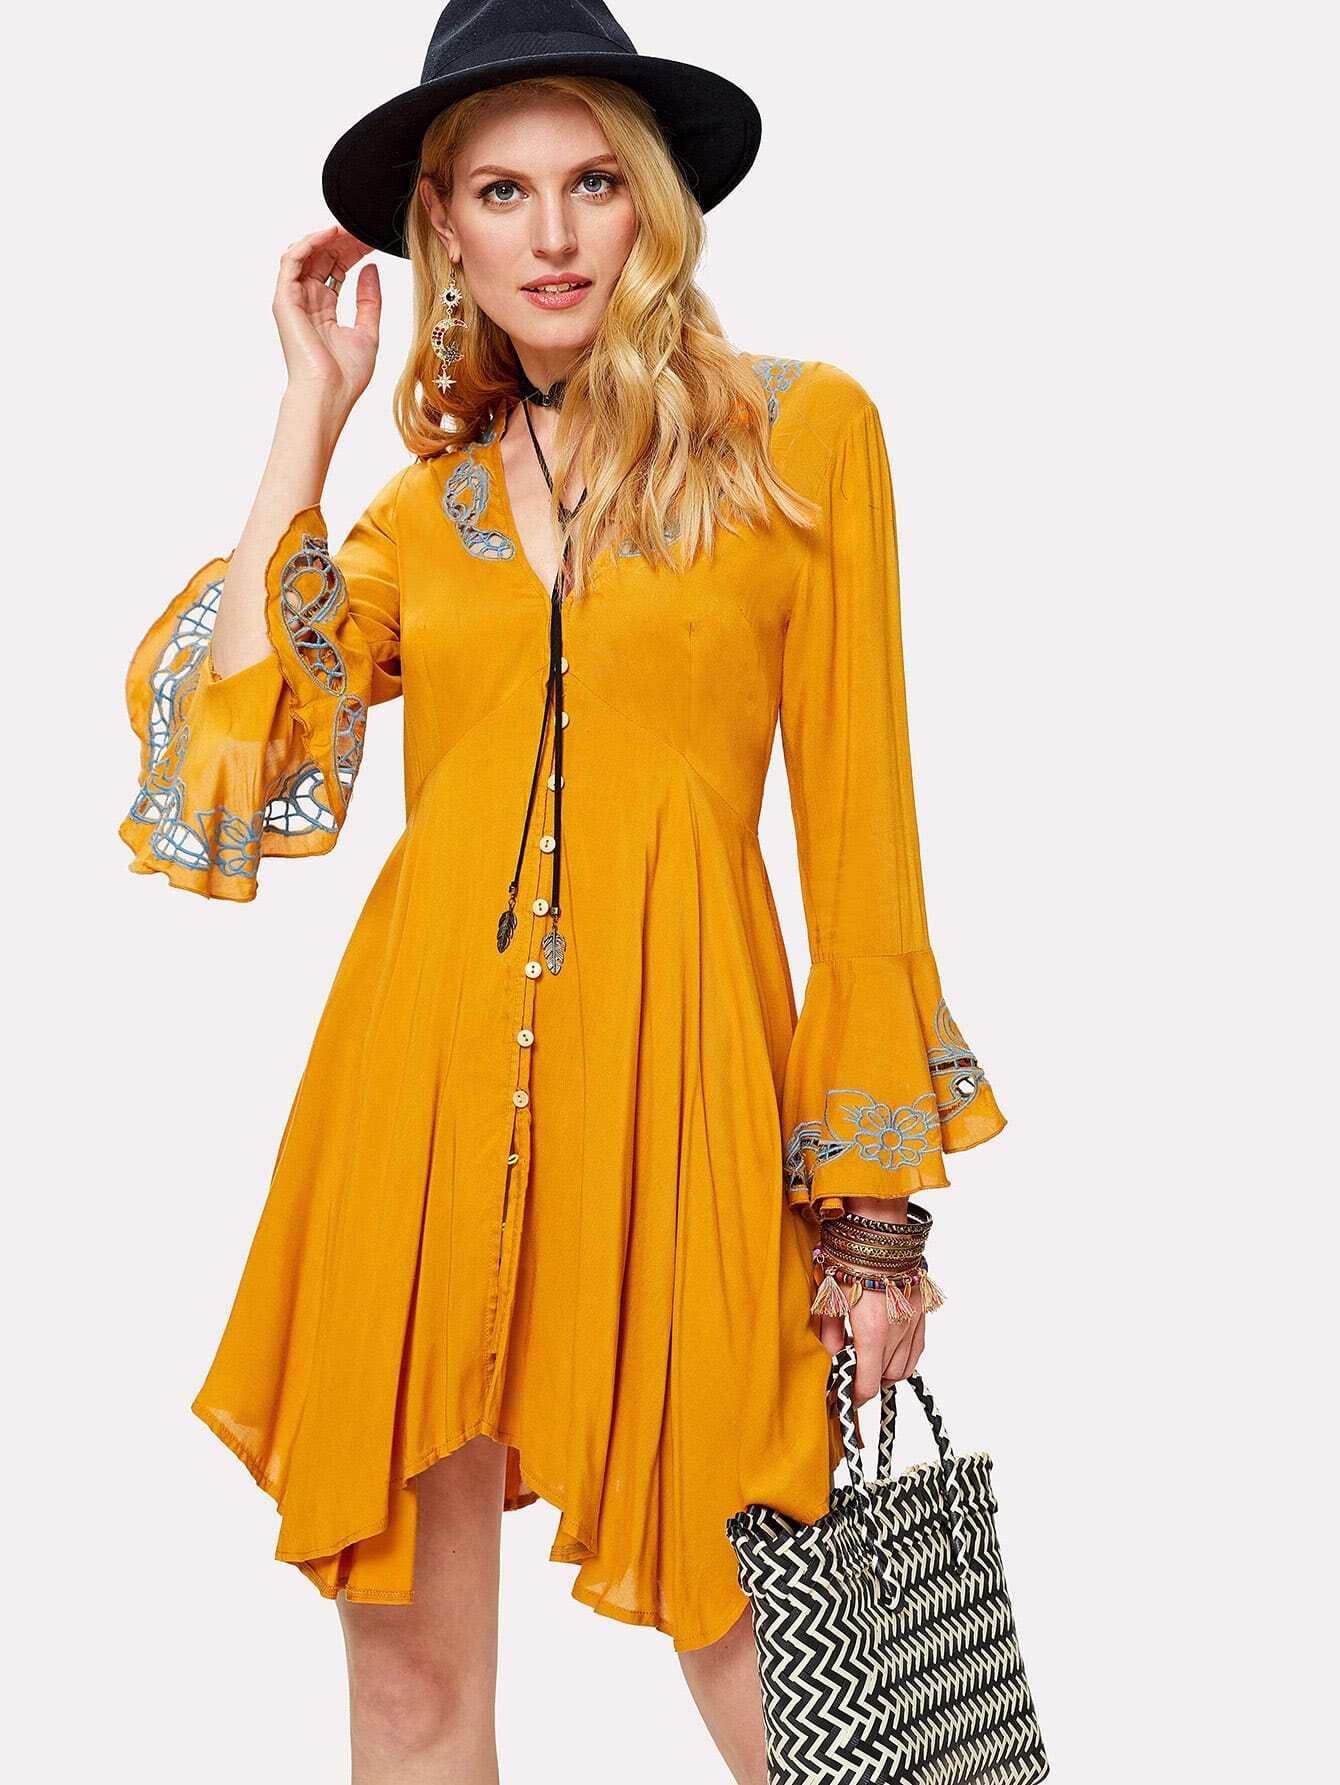 Eyelet Embroidered Button Up Hanky Hem Dress high slit hanky hem metallic halter dress